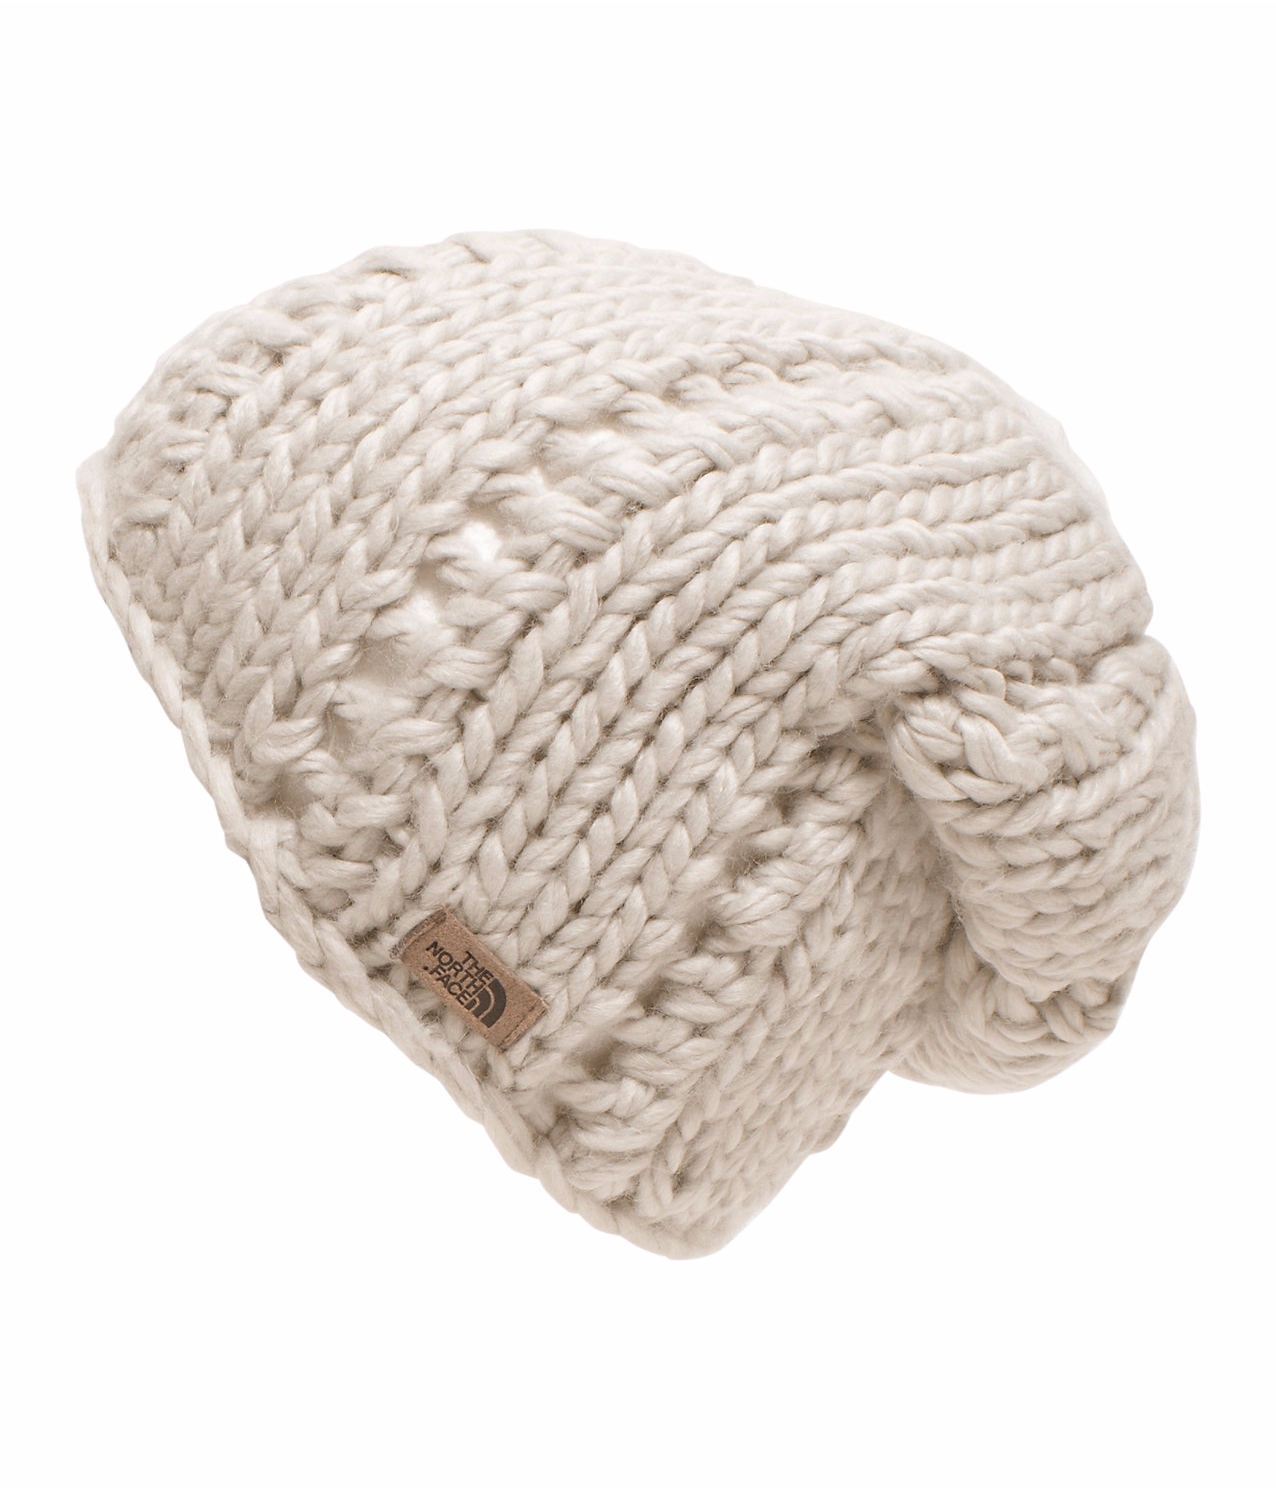 2016/17 TNF Chunky Knit Beanie VINTAGE WHITE